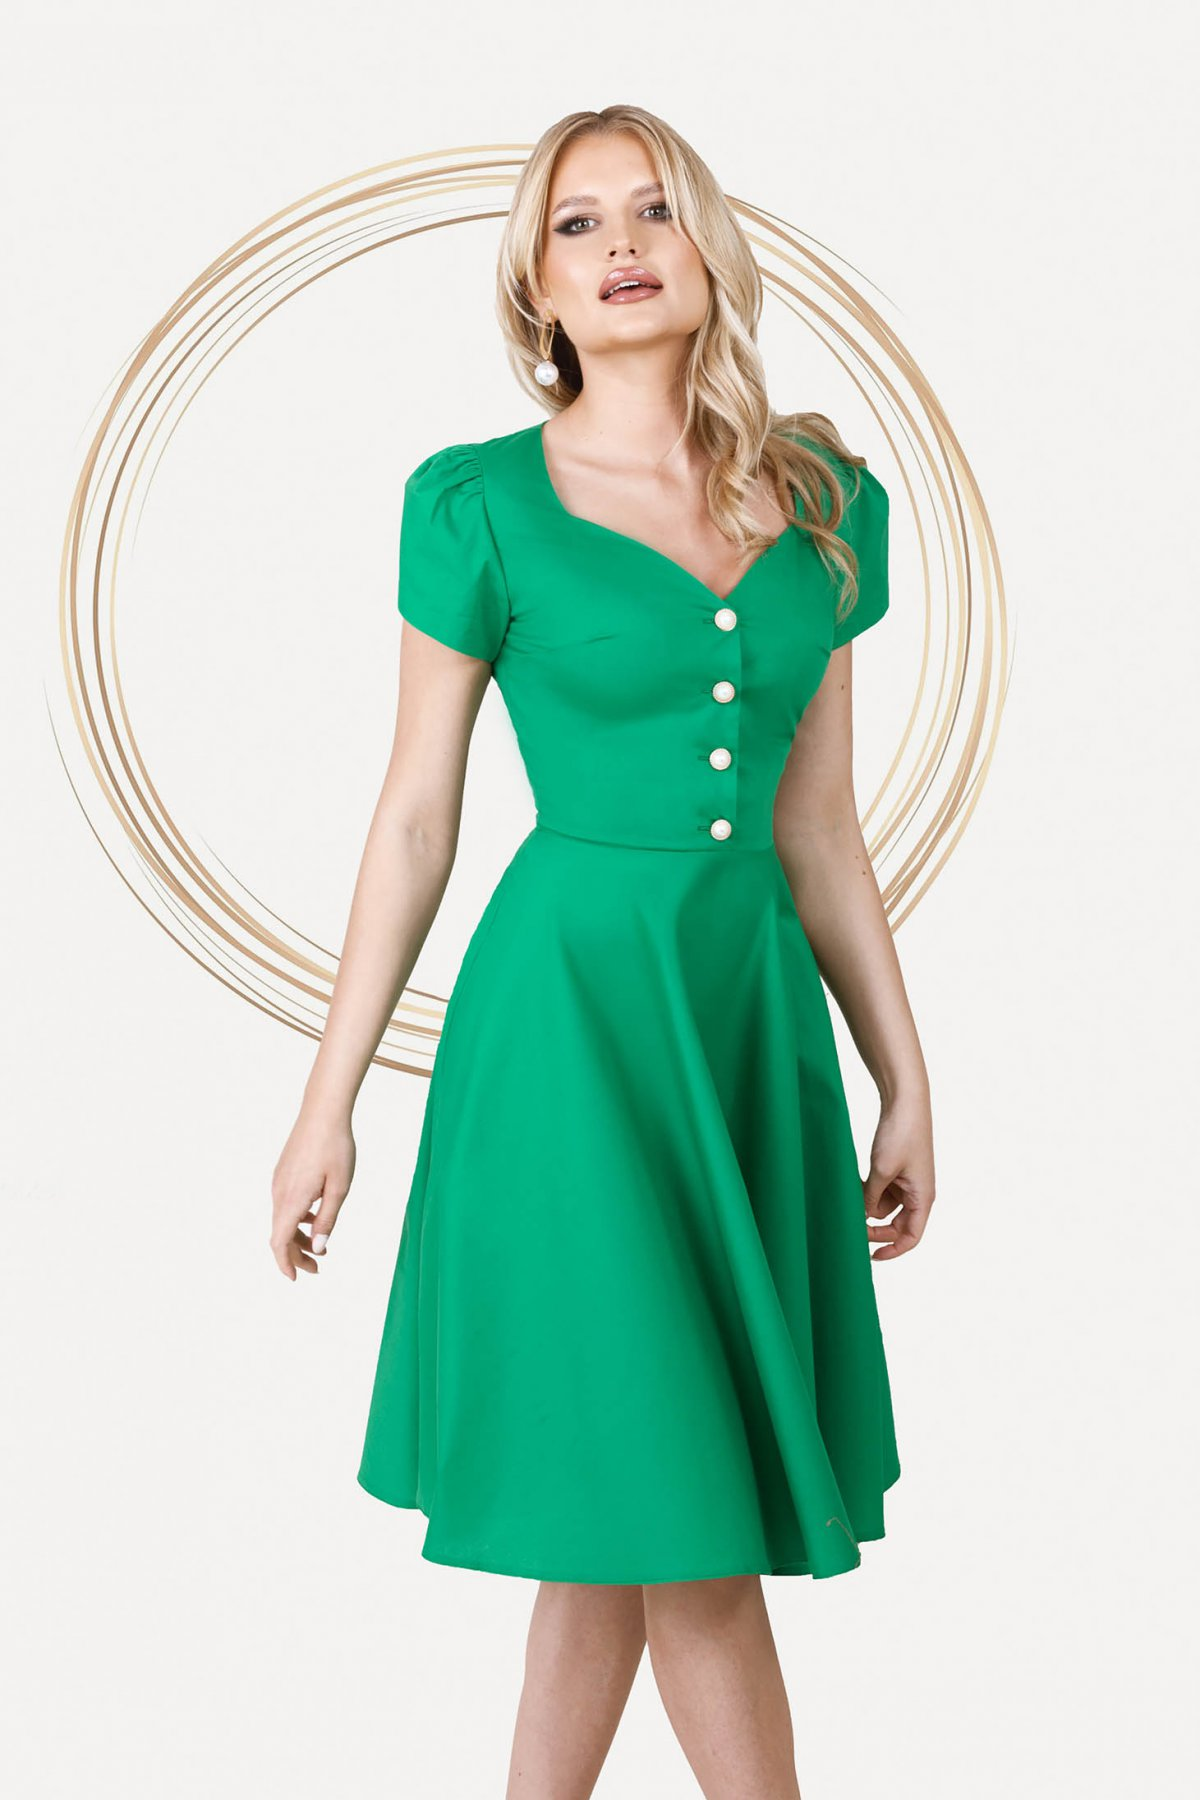 Rochie PrettyGirl verde office midi in clos din poplin usor elastic cu decolteu inima